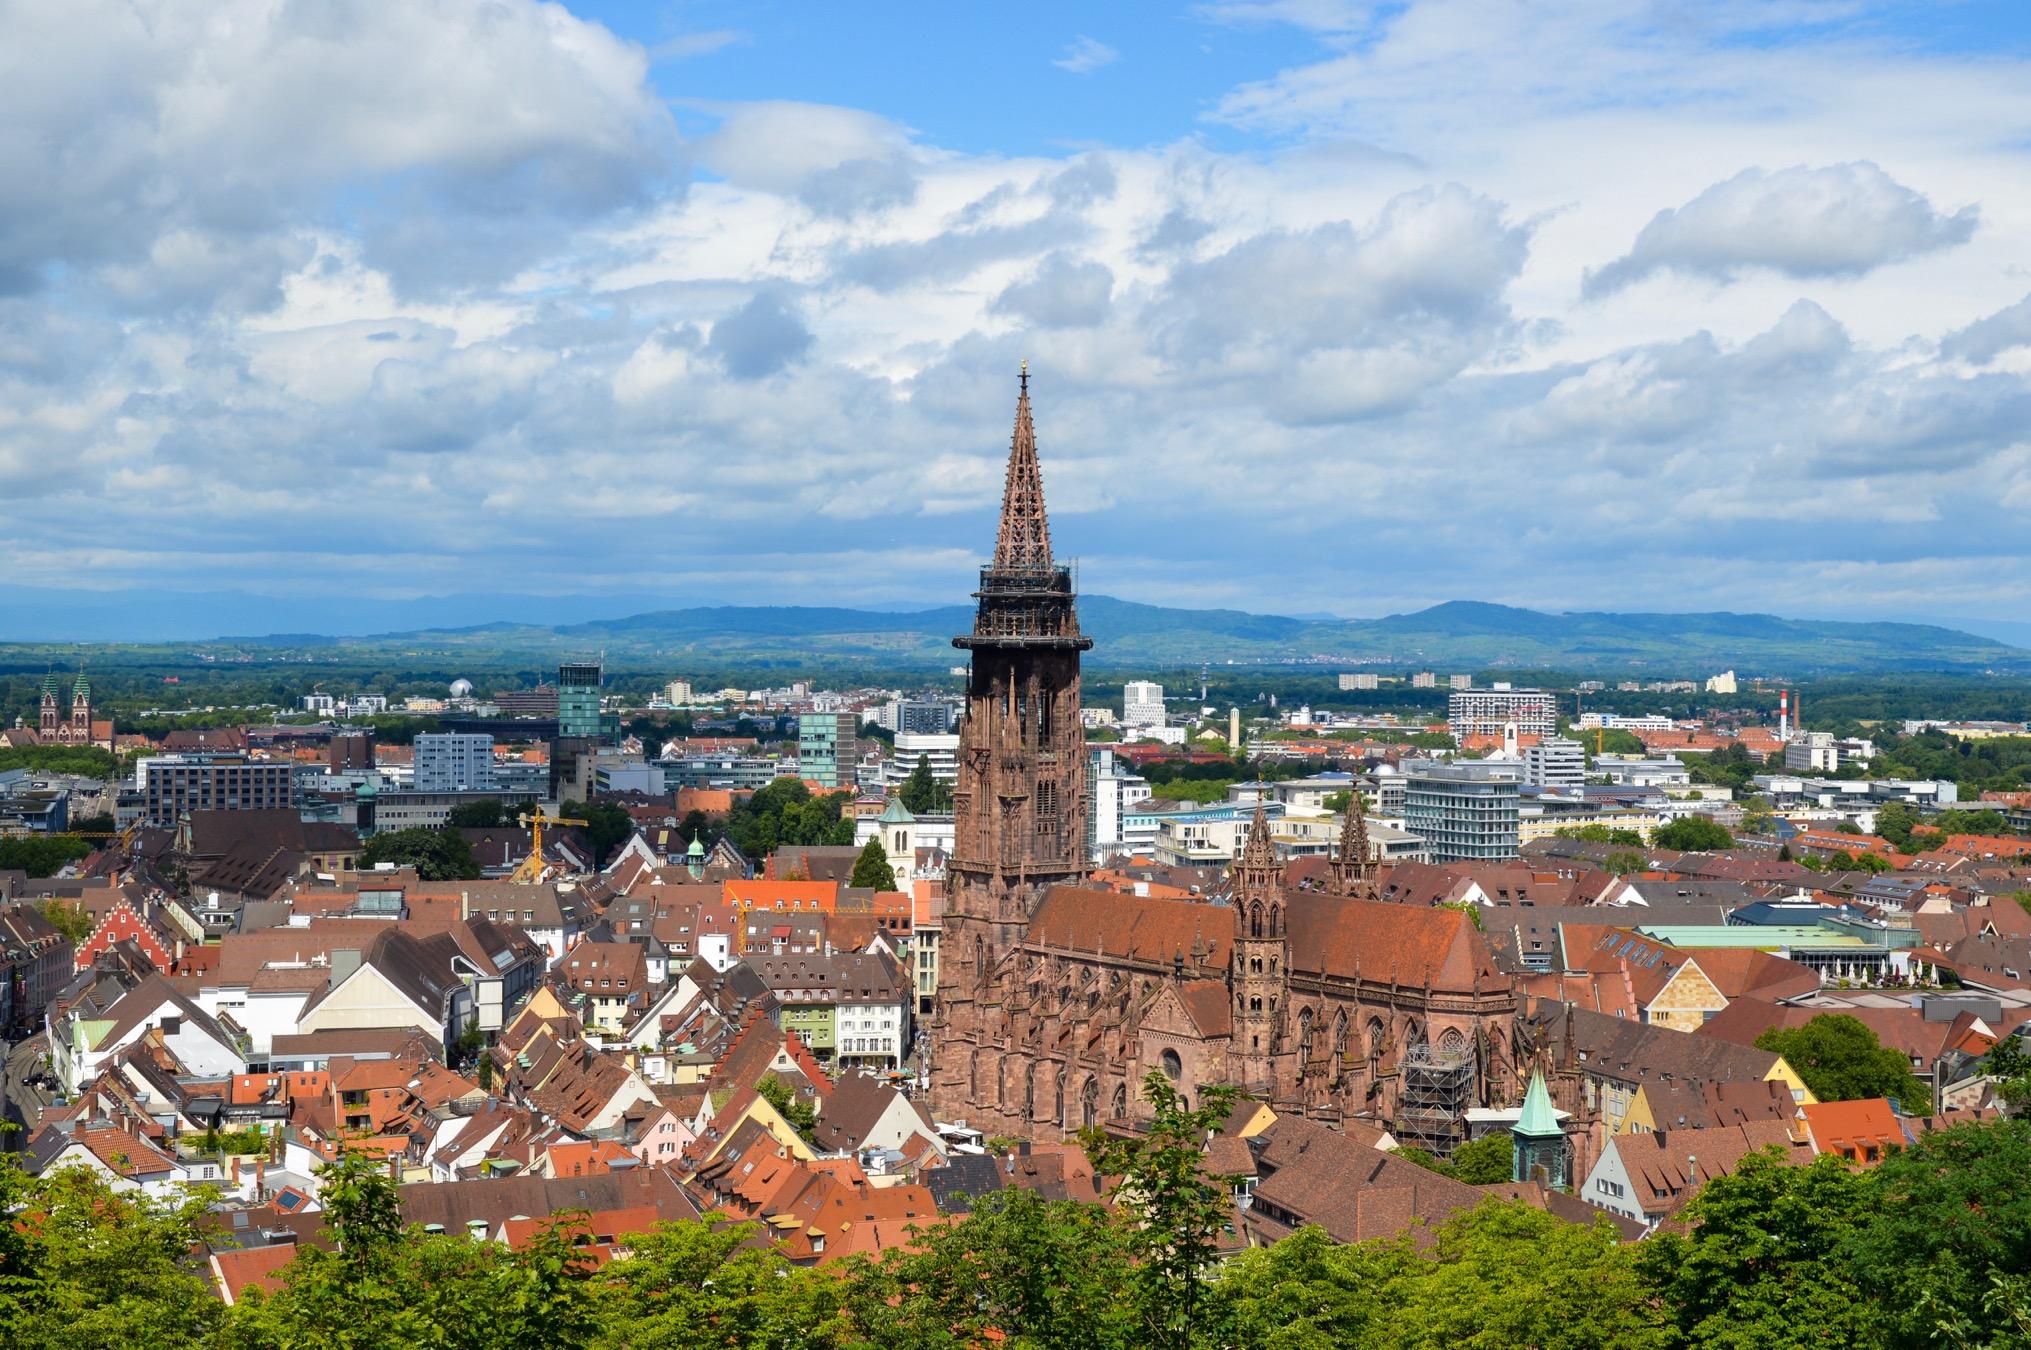 Freiburger Münster, Freiburg, Germany